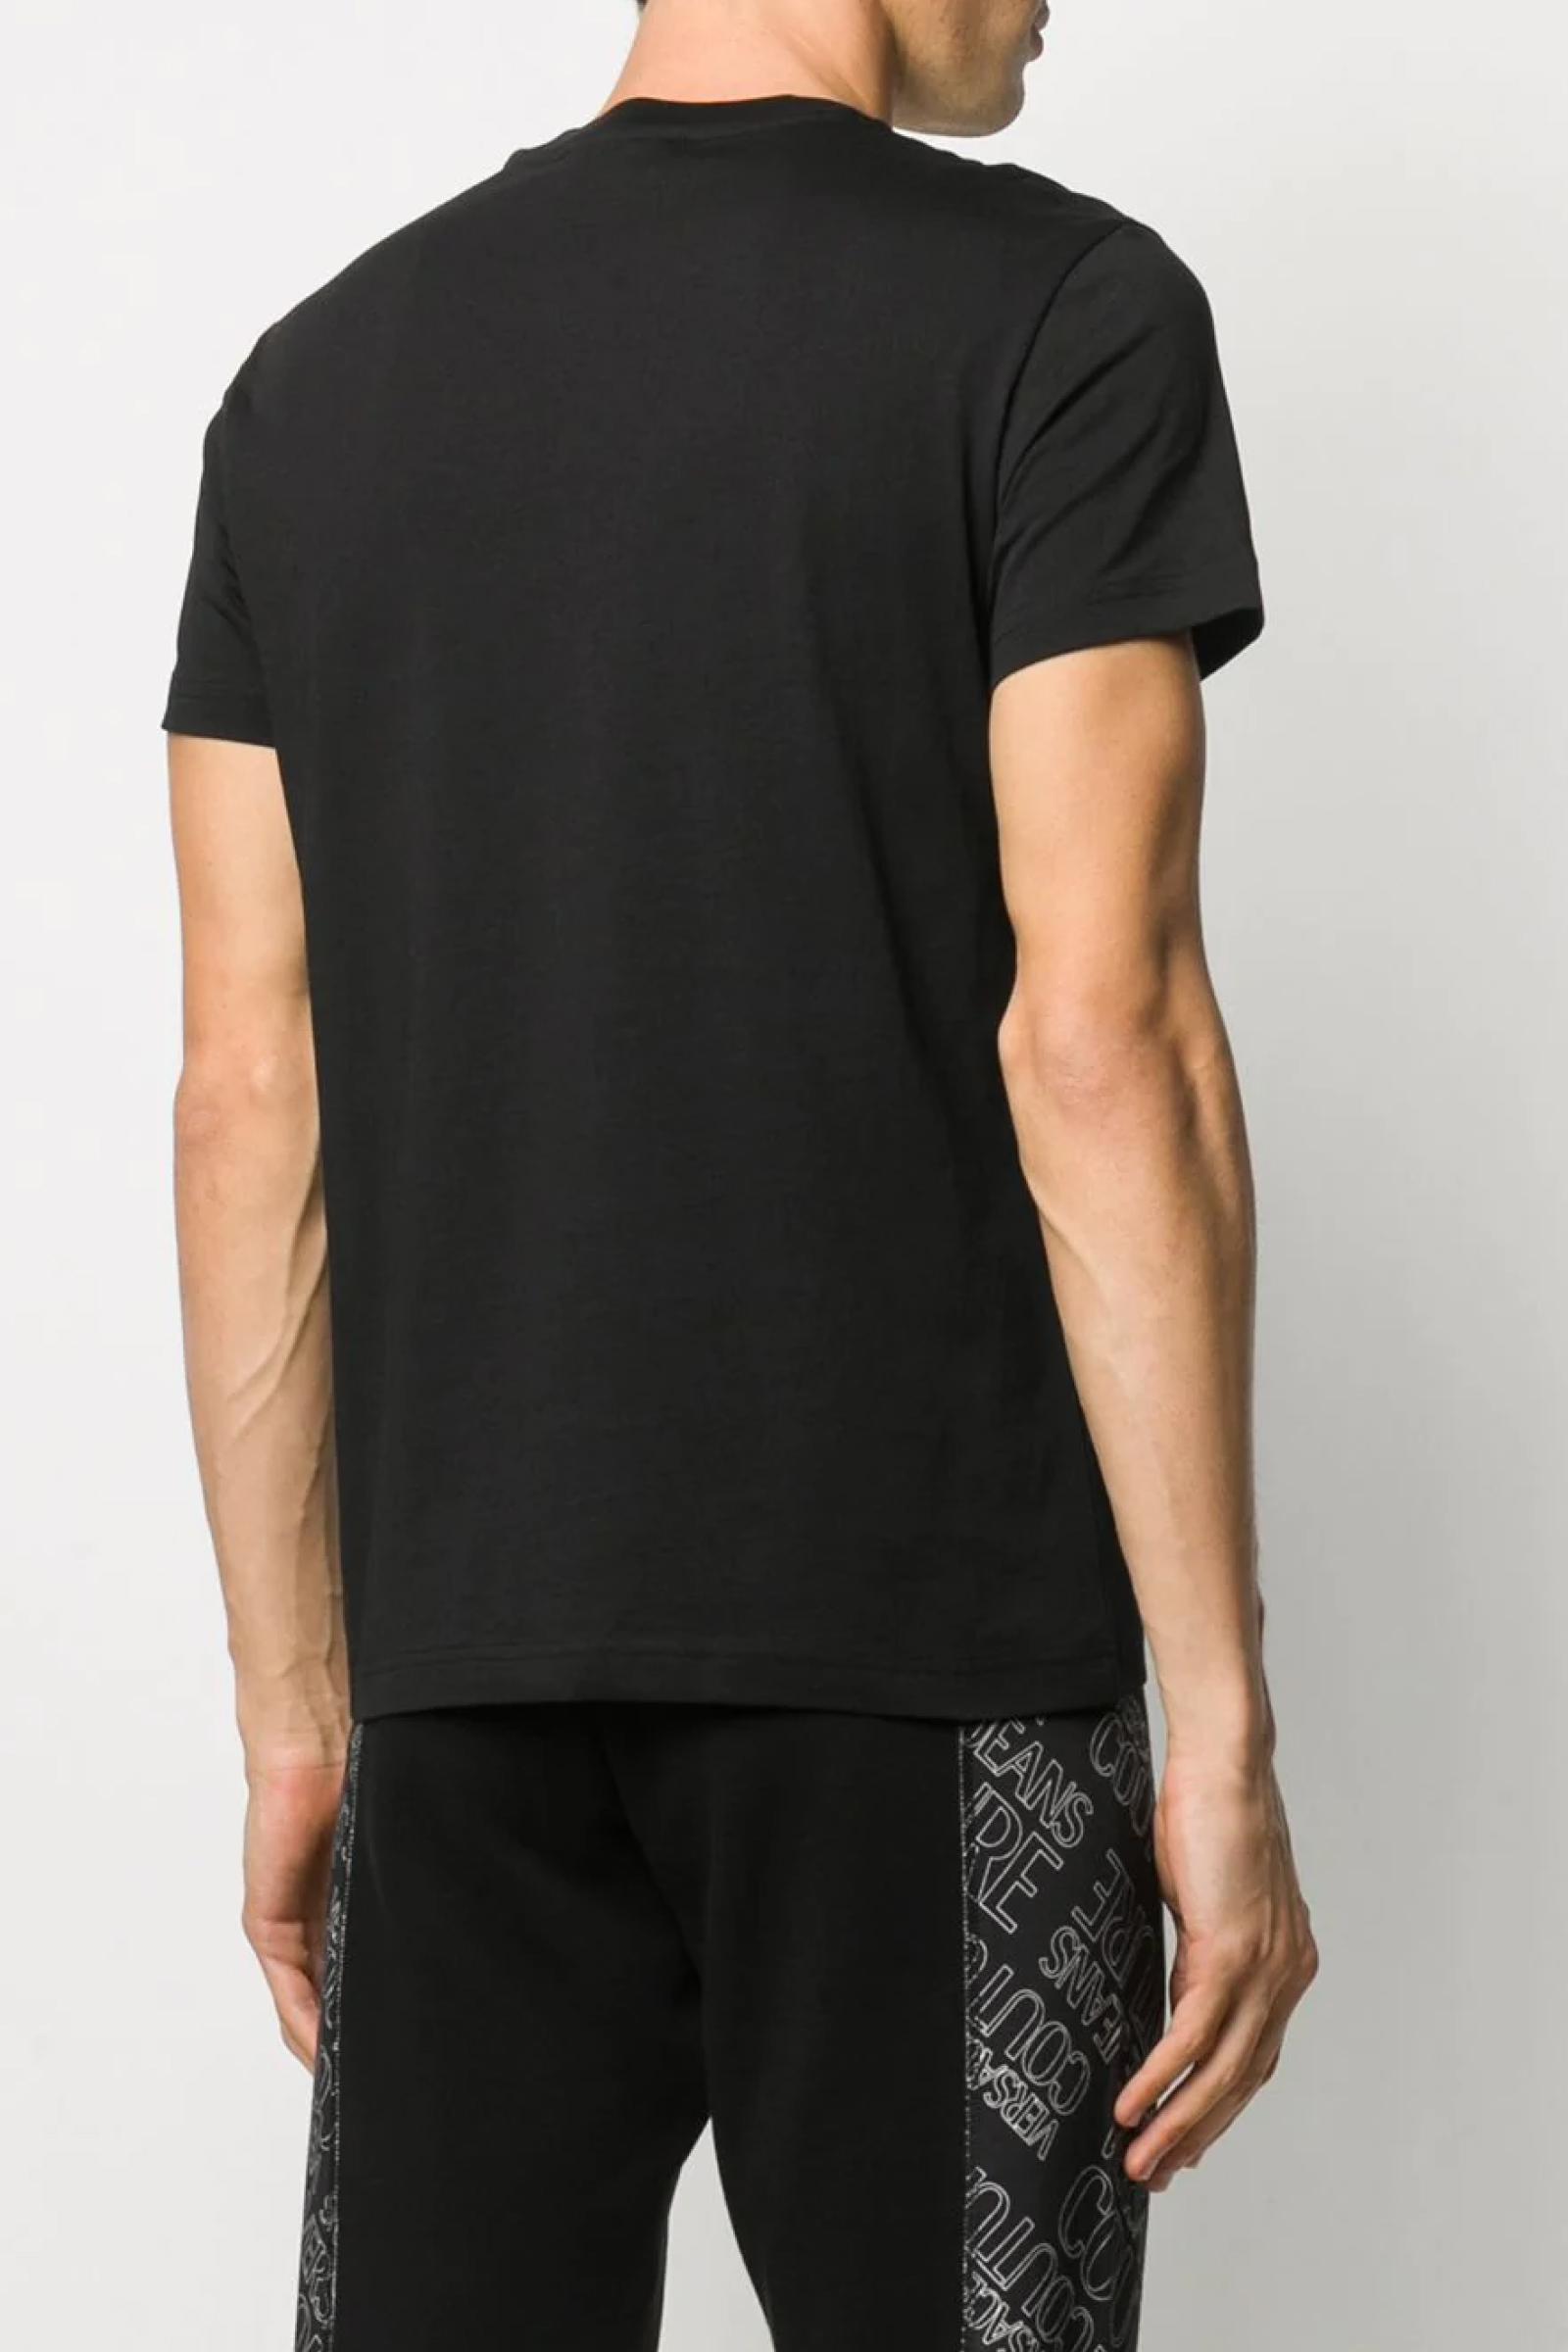 VERSACE JEANS COUTURE VERSACE JEANS COUTURE   T-Shirt   B3GZB7TC 30319K42 ZUM600